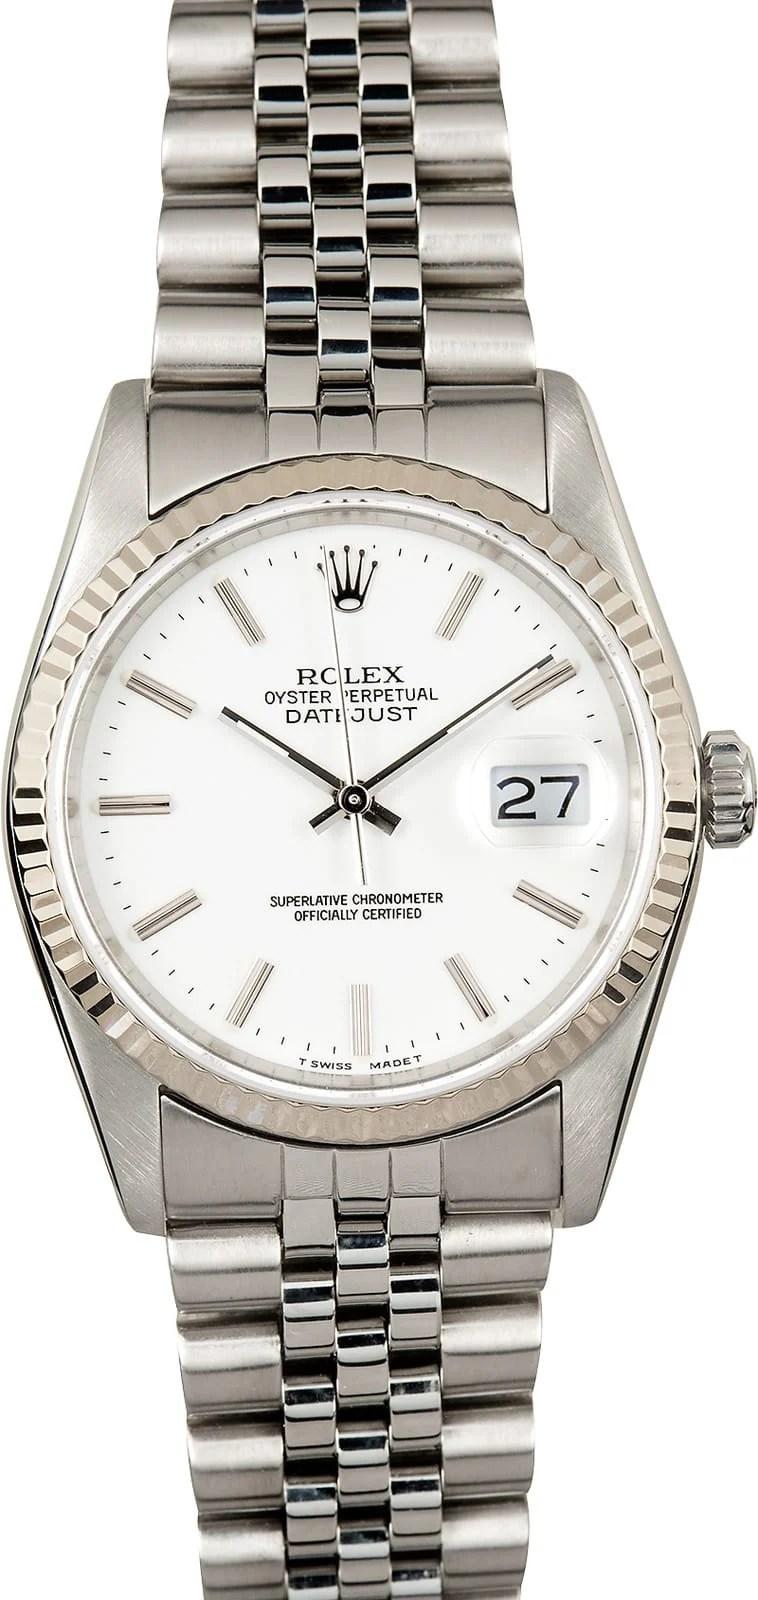 Rolex Datejust 16234 White Dial